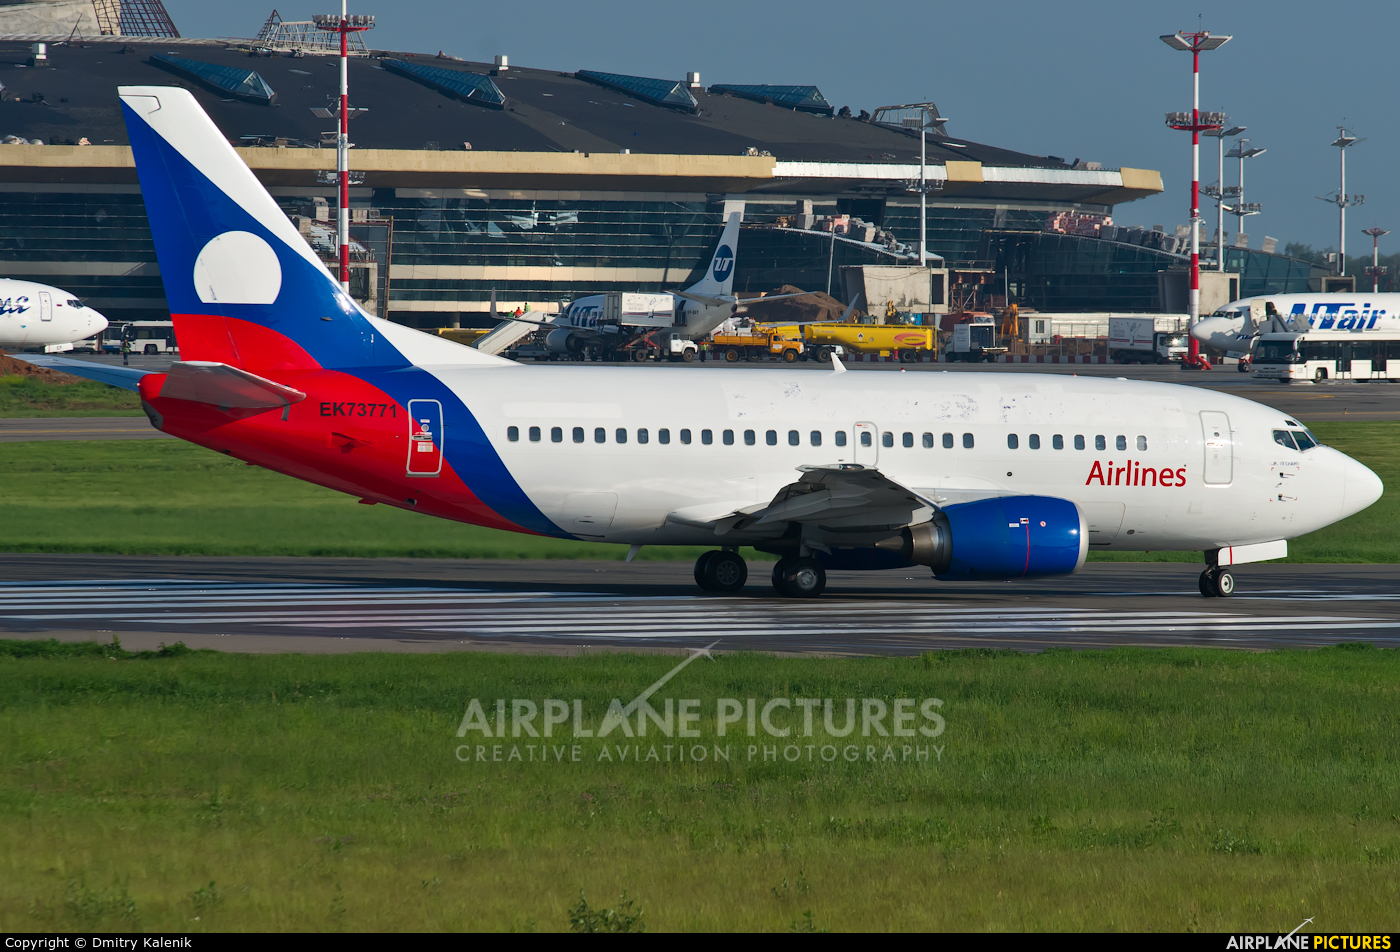 Armavia EK73771 aircraft at Moscow - Vnukovo